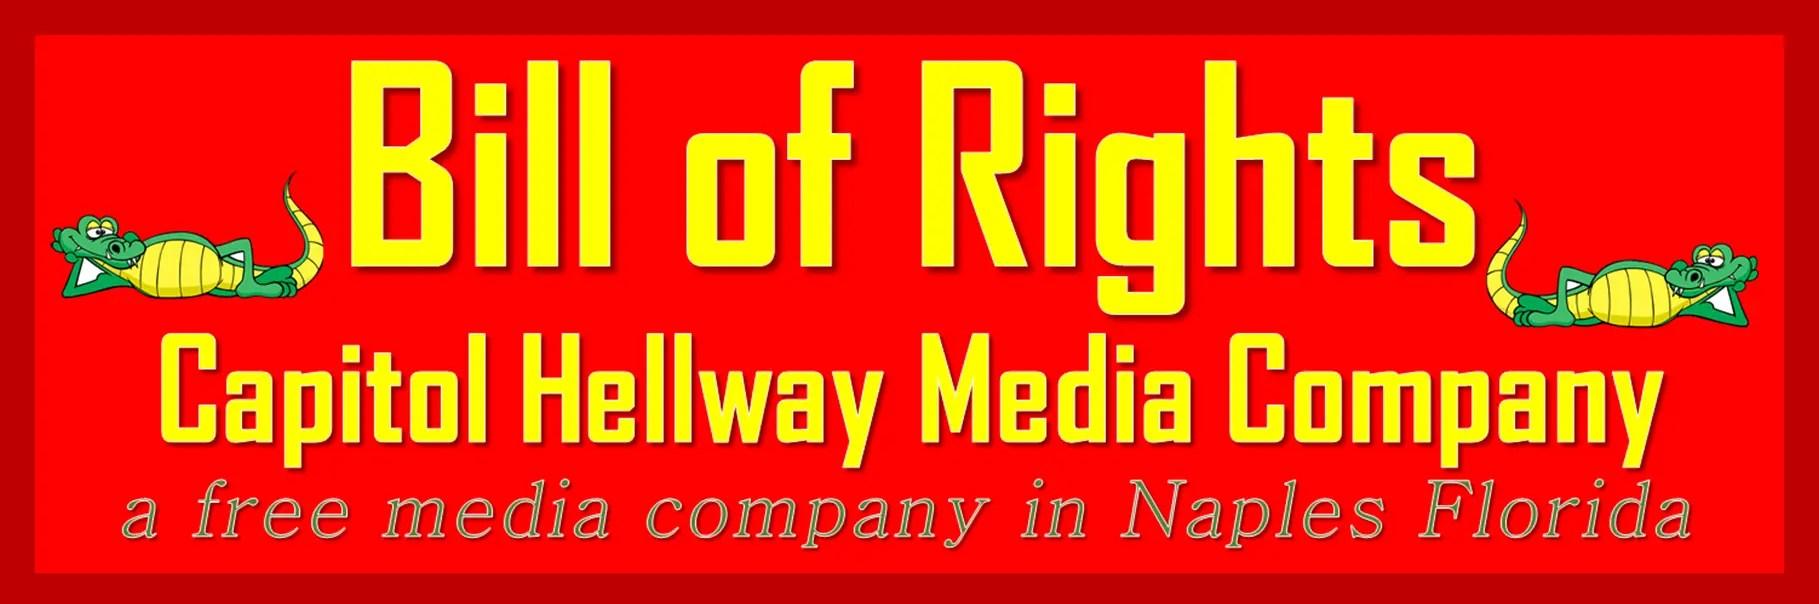 Bill of Rights - Capitol Hellway Media Company